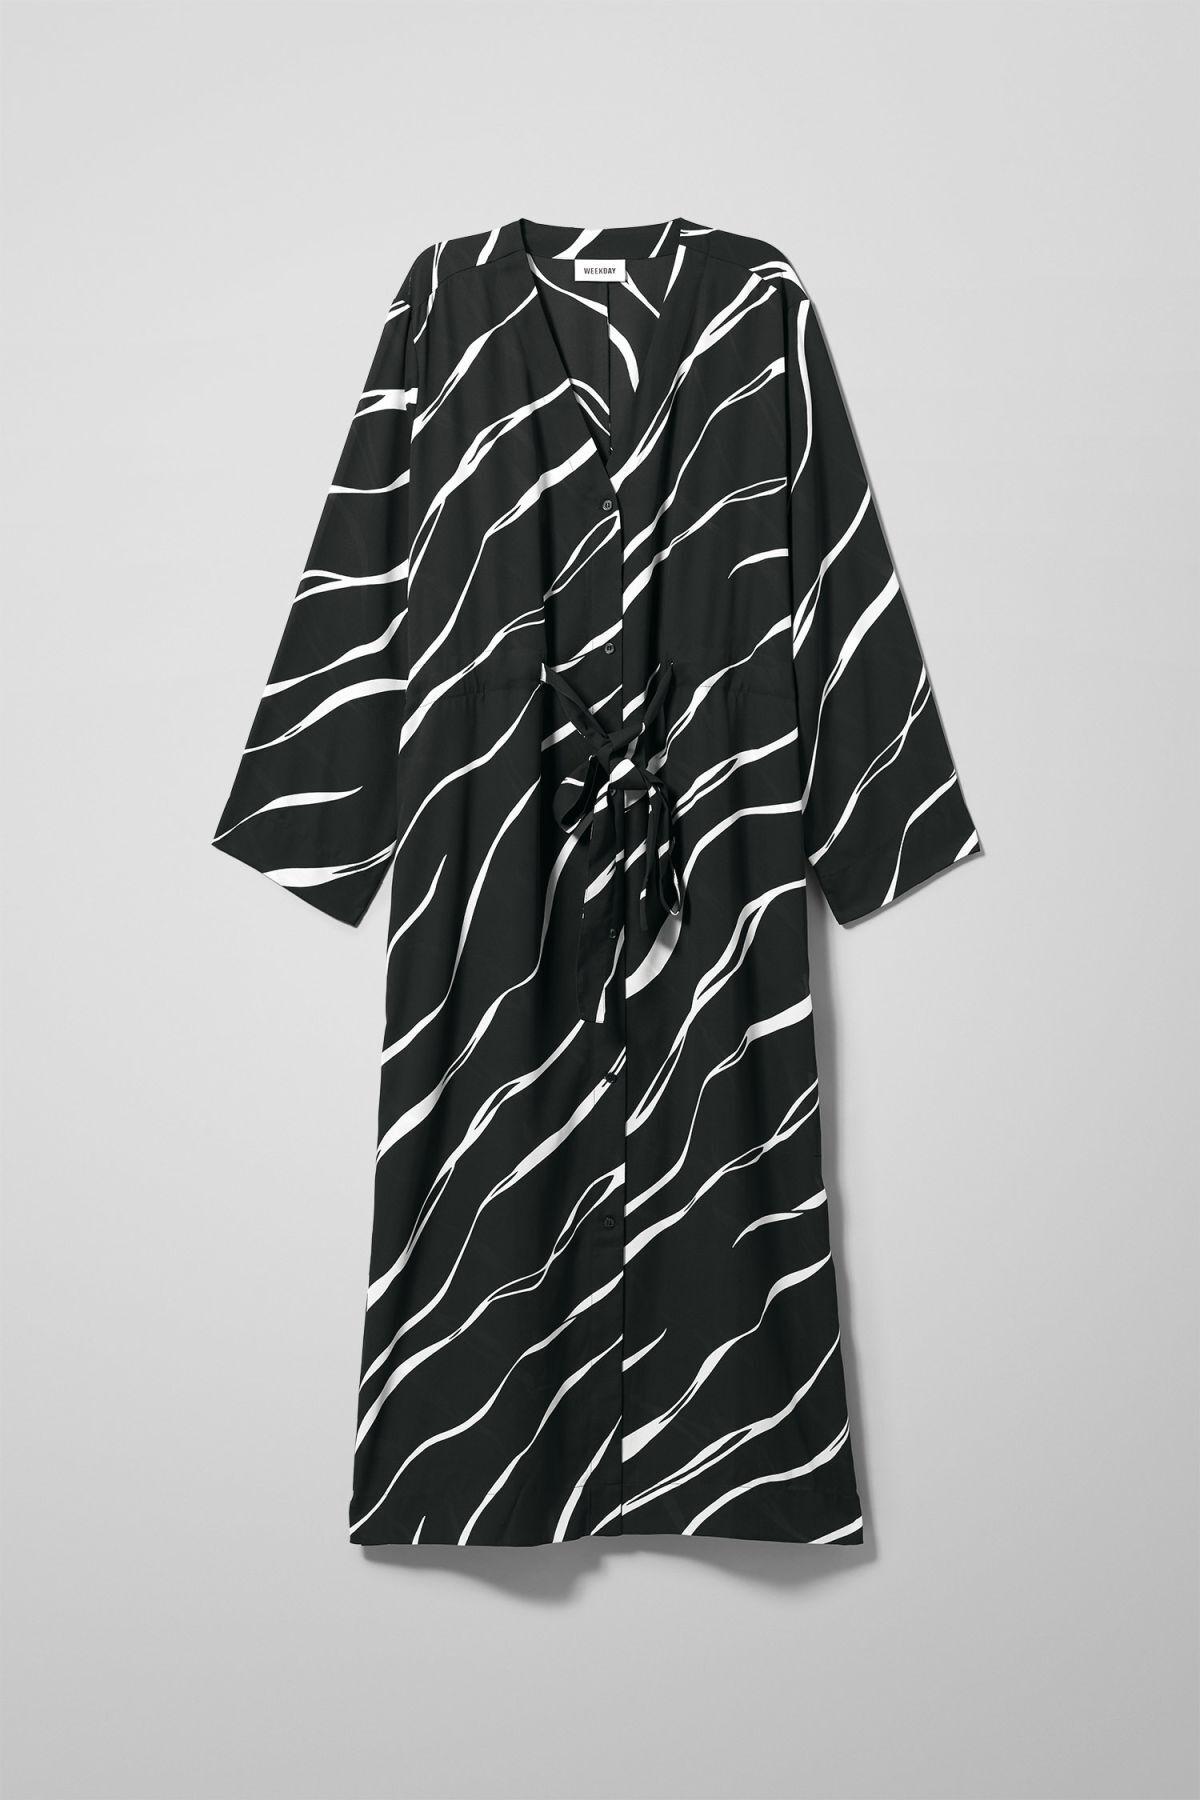 Image of Chalk Long Sleeve Dress - Black-XS